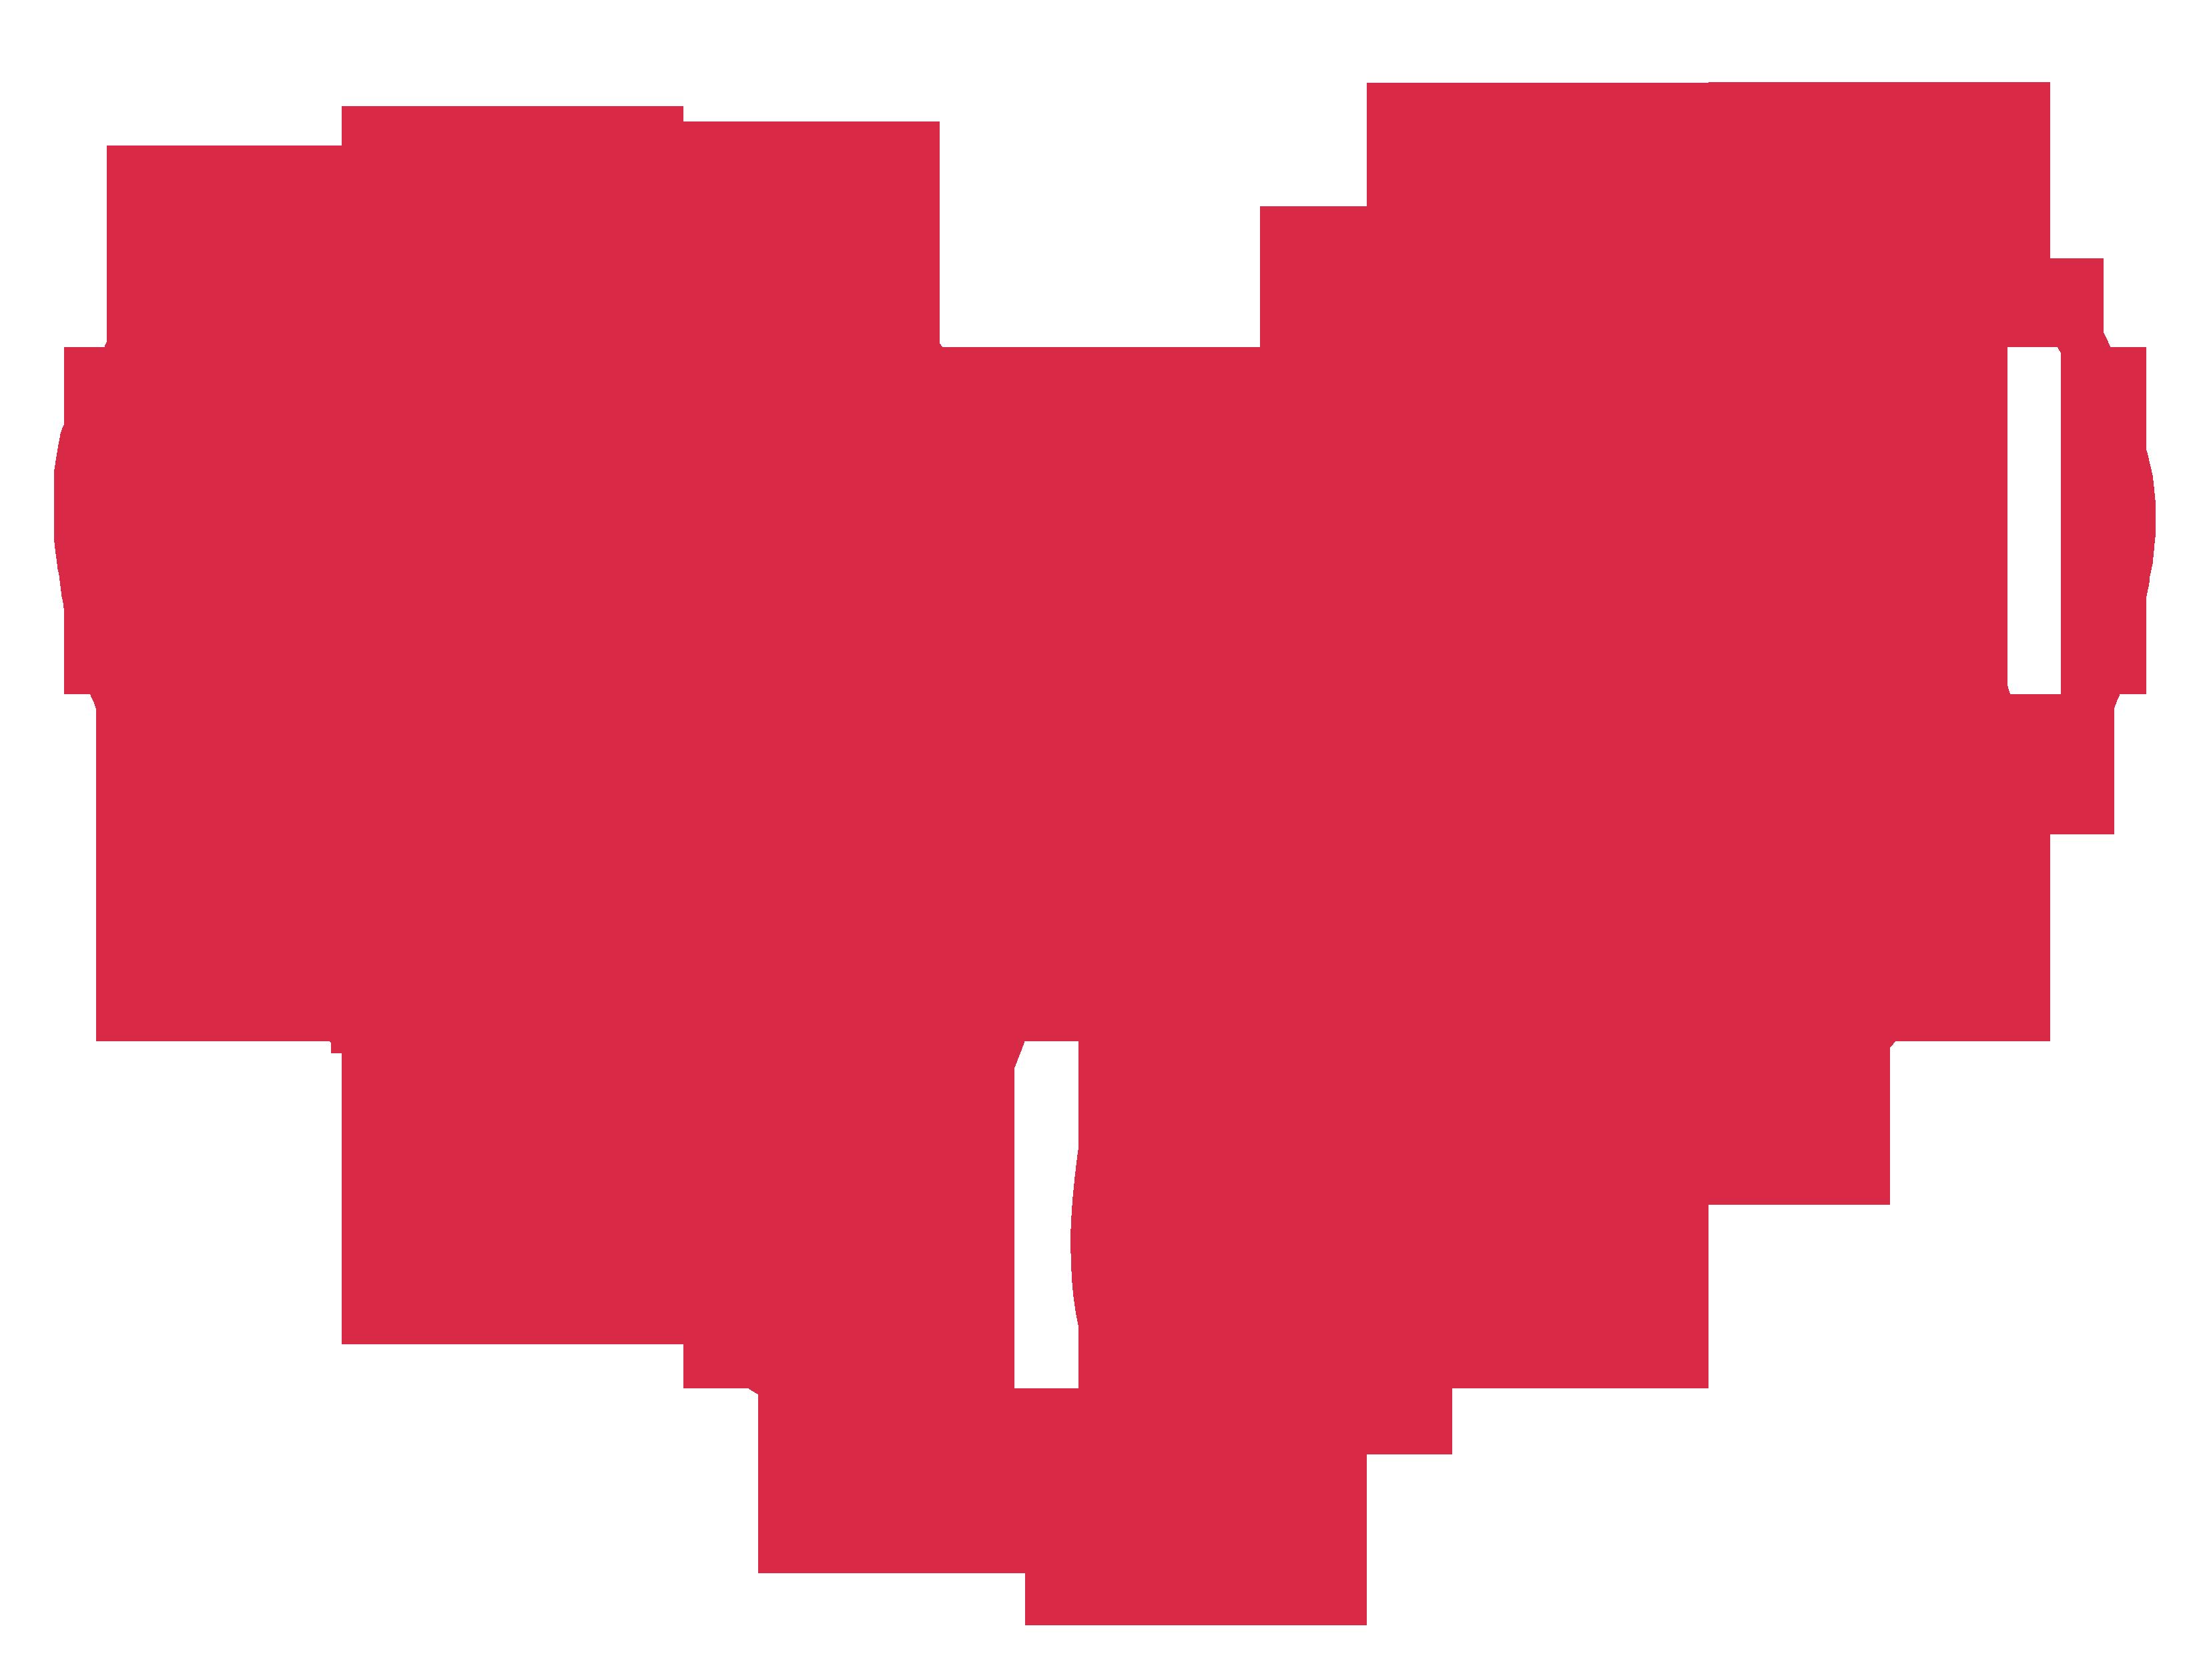 Heart clipart dance. Open free download best